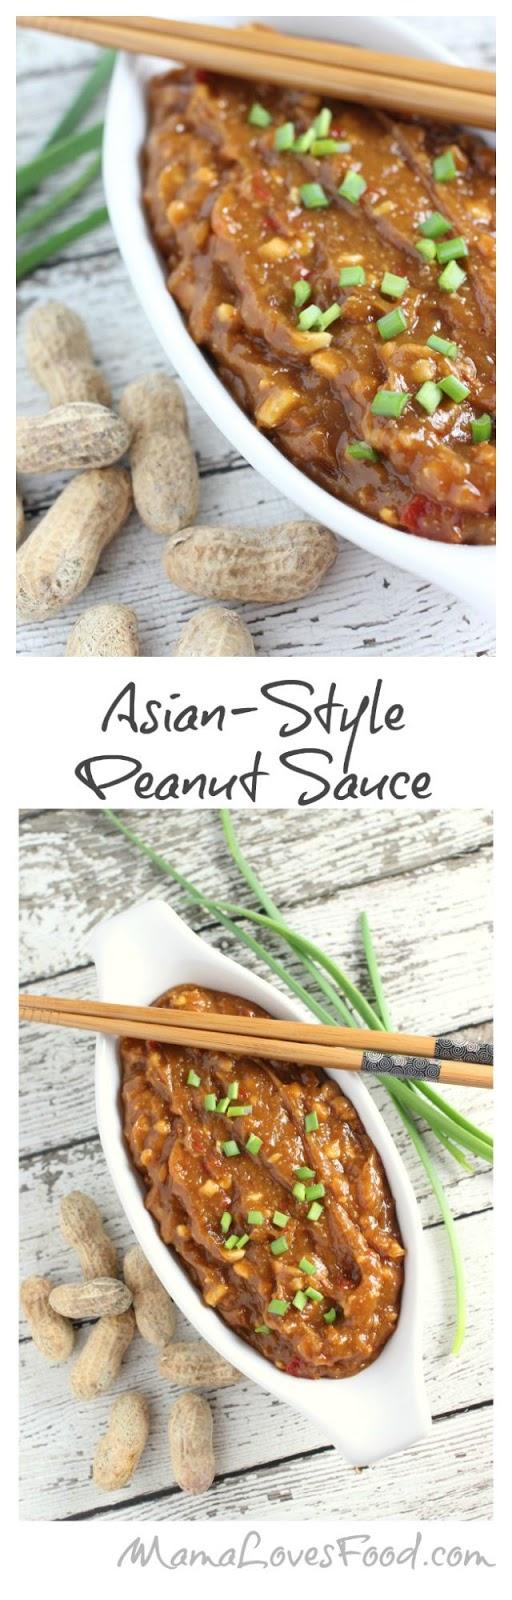 Three Ingredient Asian Style Peanut Sauce